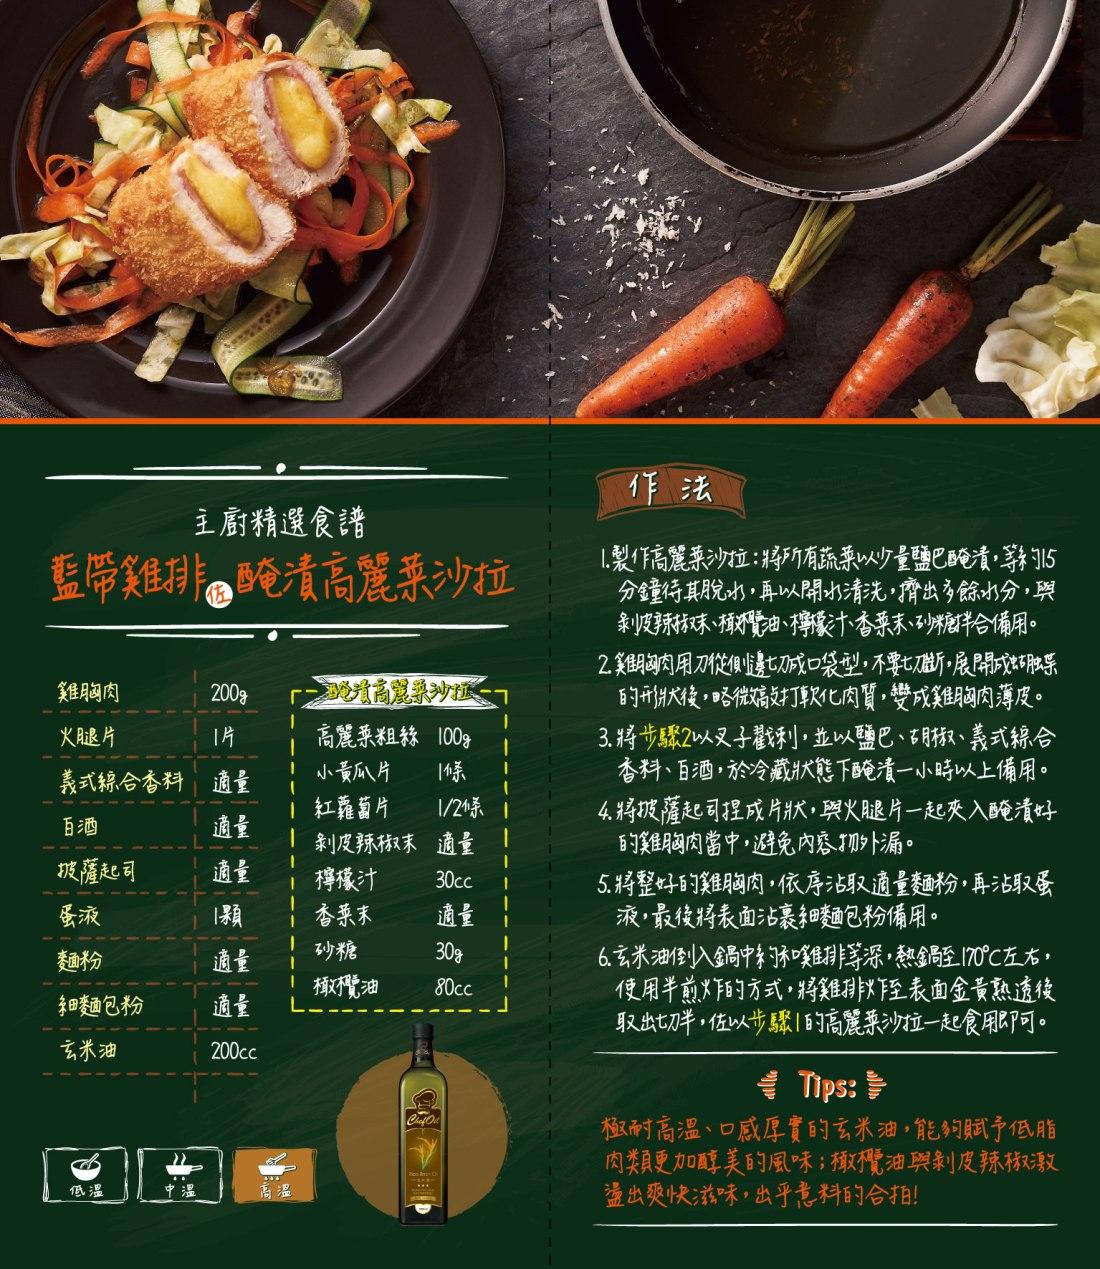 Taisun_主廚精選_Brochure設計(750-1000ml)_P12-13_20170606_1.jpg